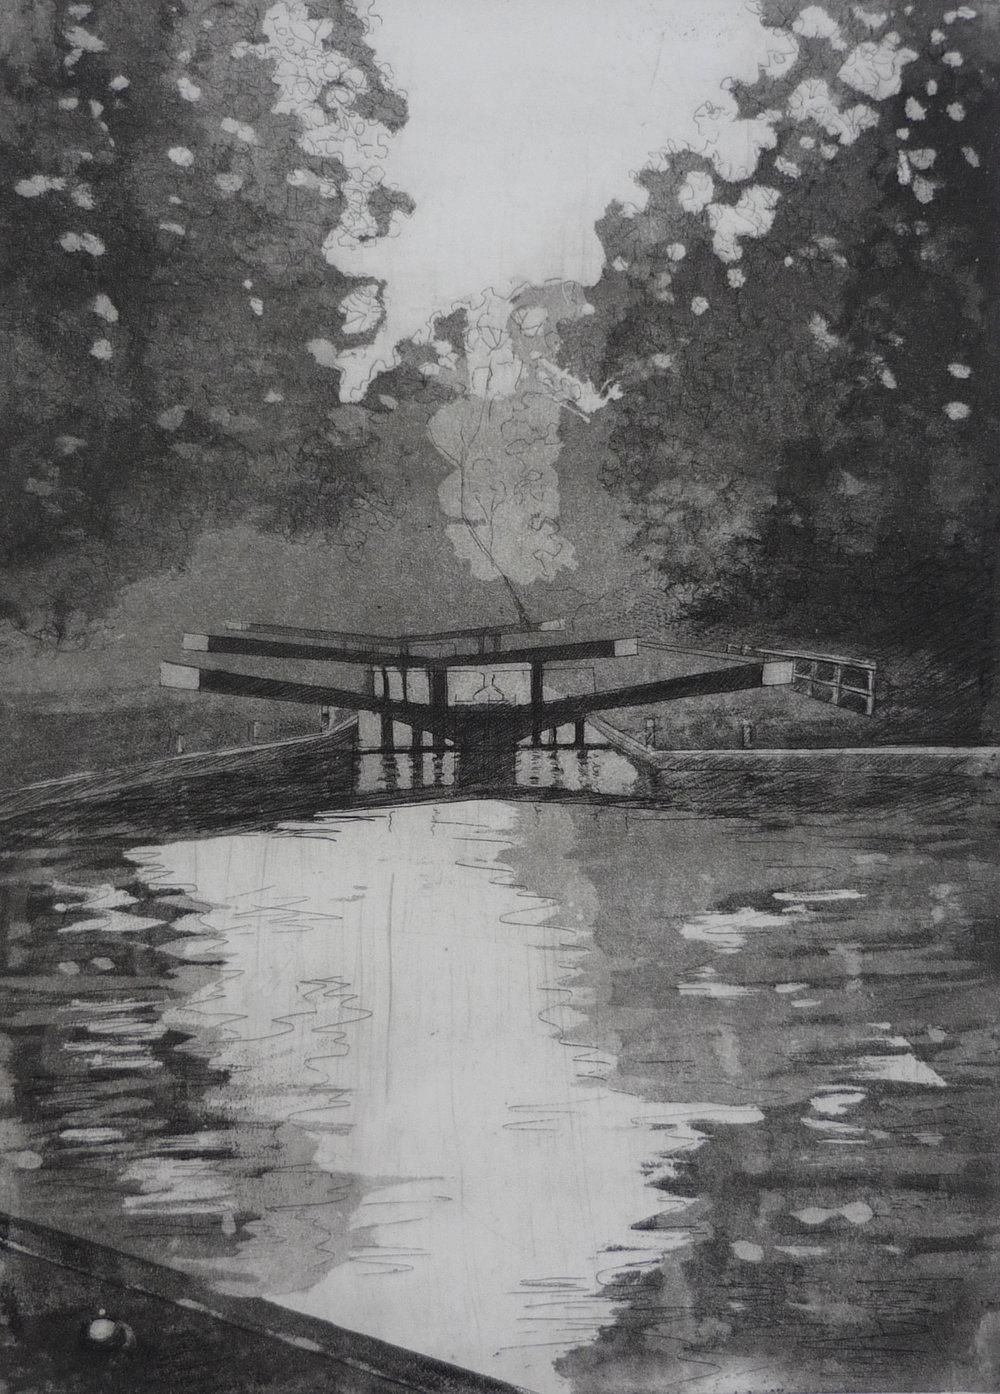 Jessica Rose, Hanwell Locks, Etching on paper, 53 cm x 41 cm x 0 cm,  http://jessicaroseartist.co.uk